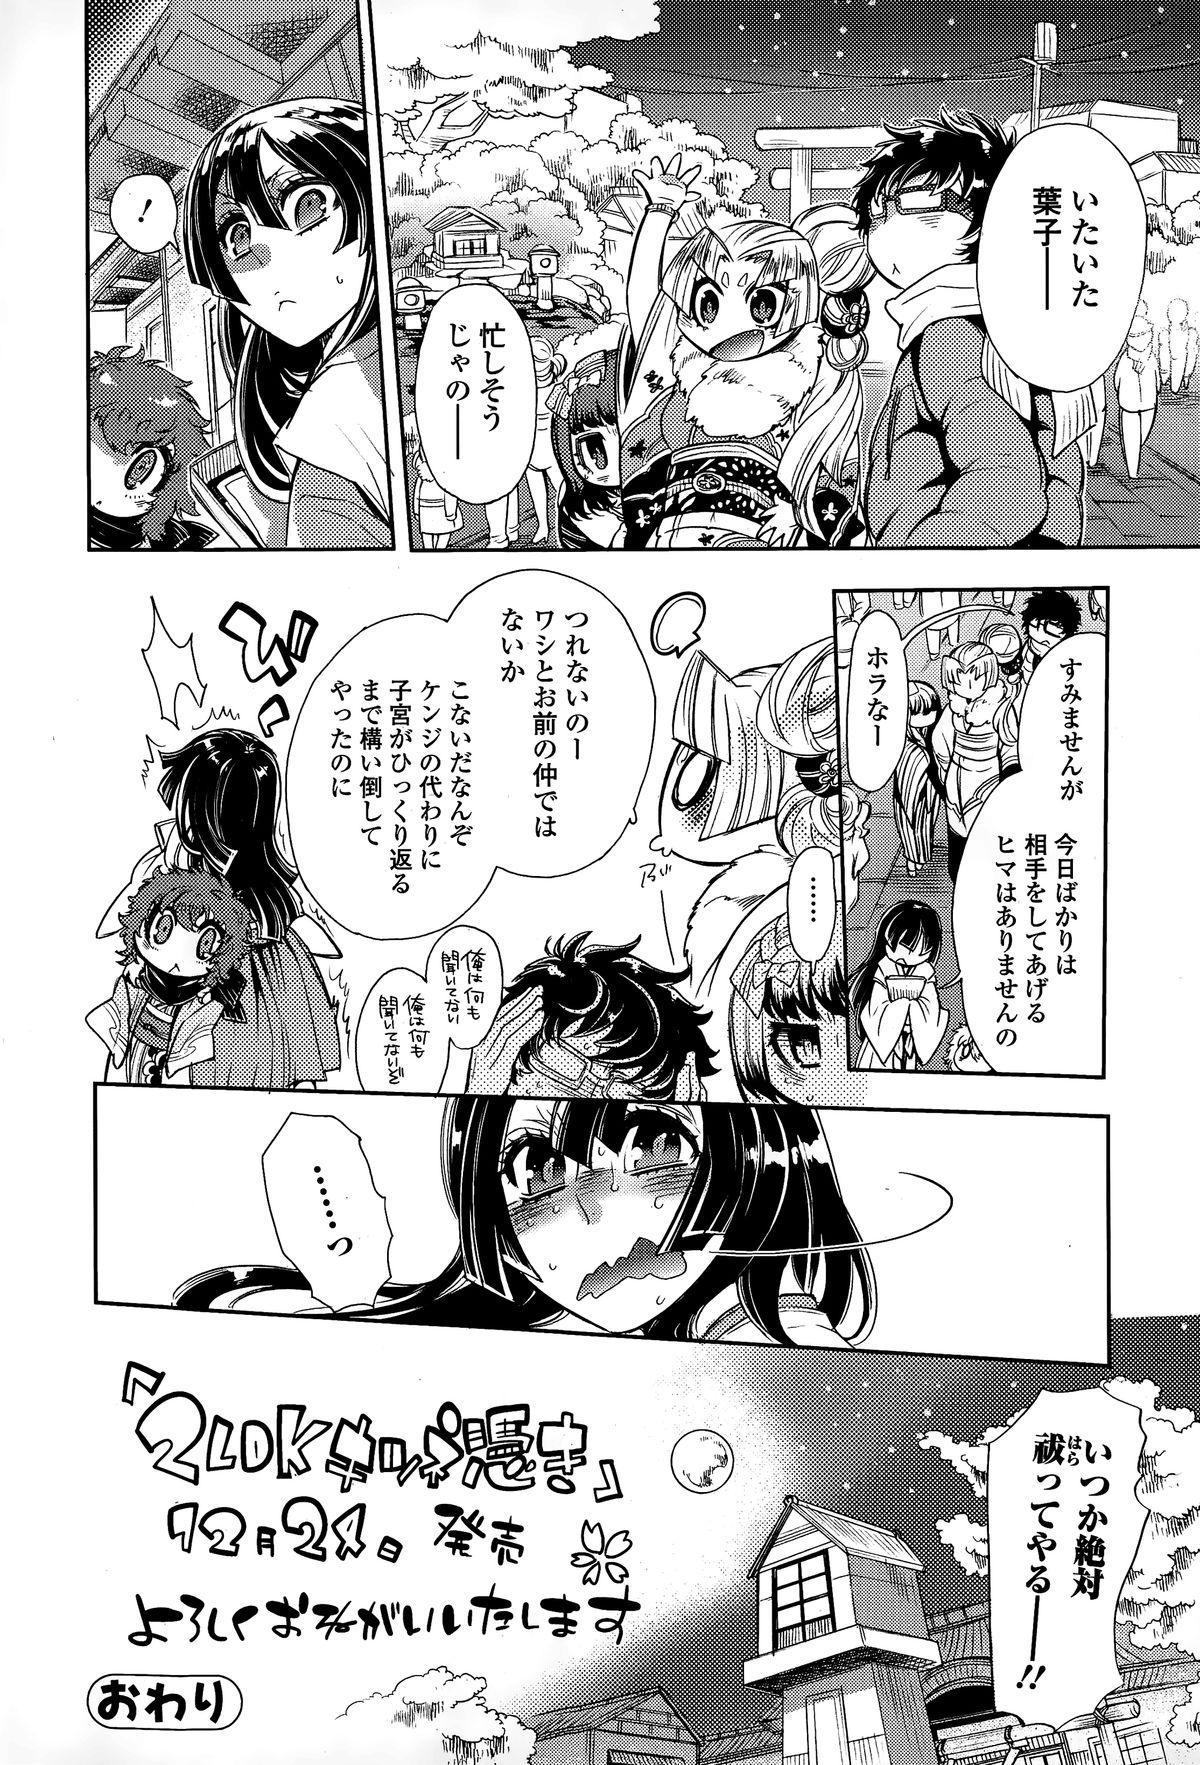 Comic Toutetsu 2015-02 Vol. 3 233